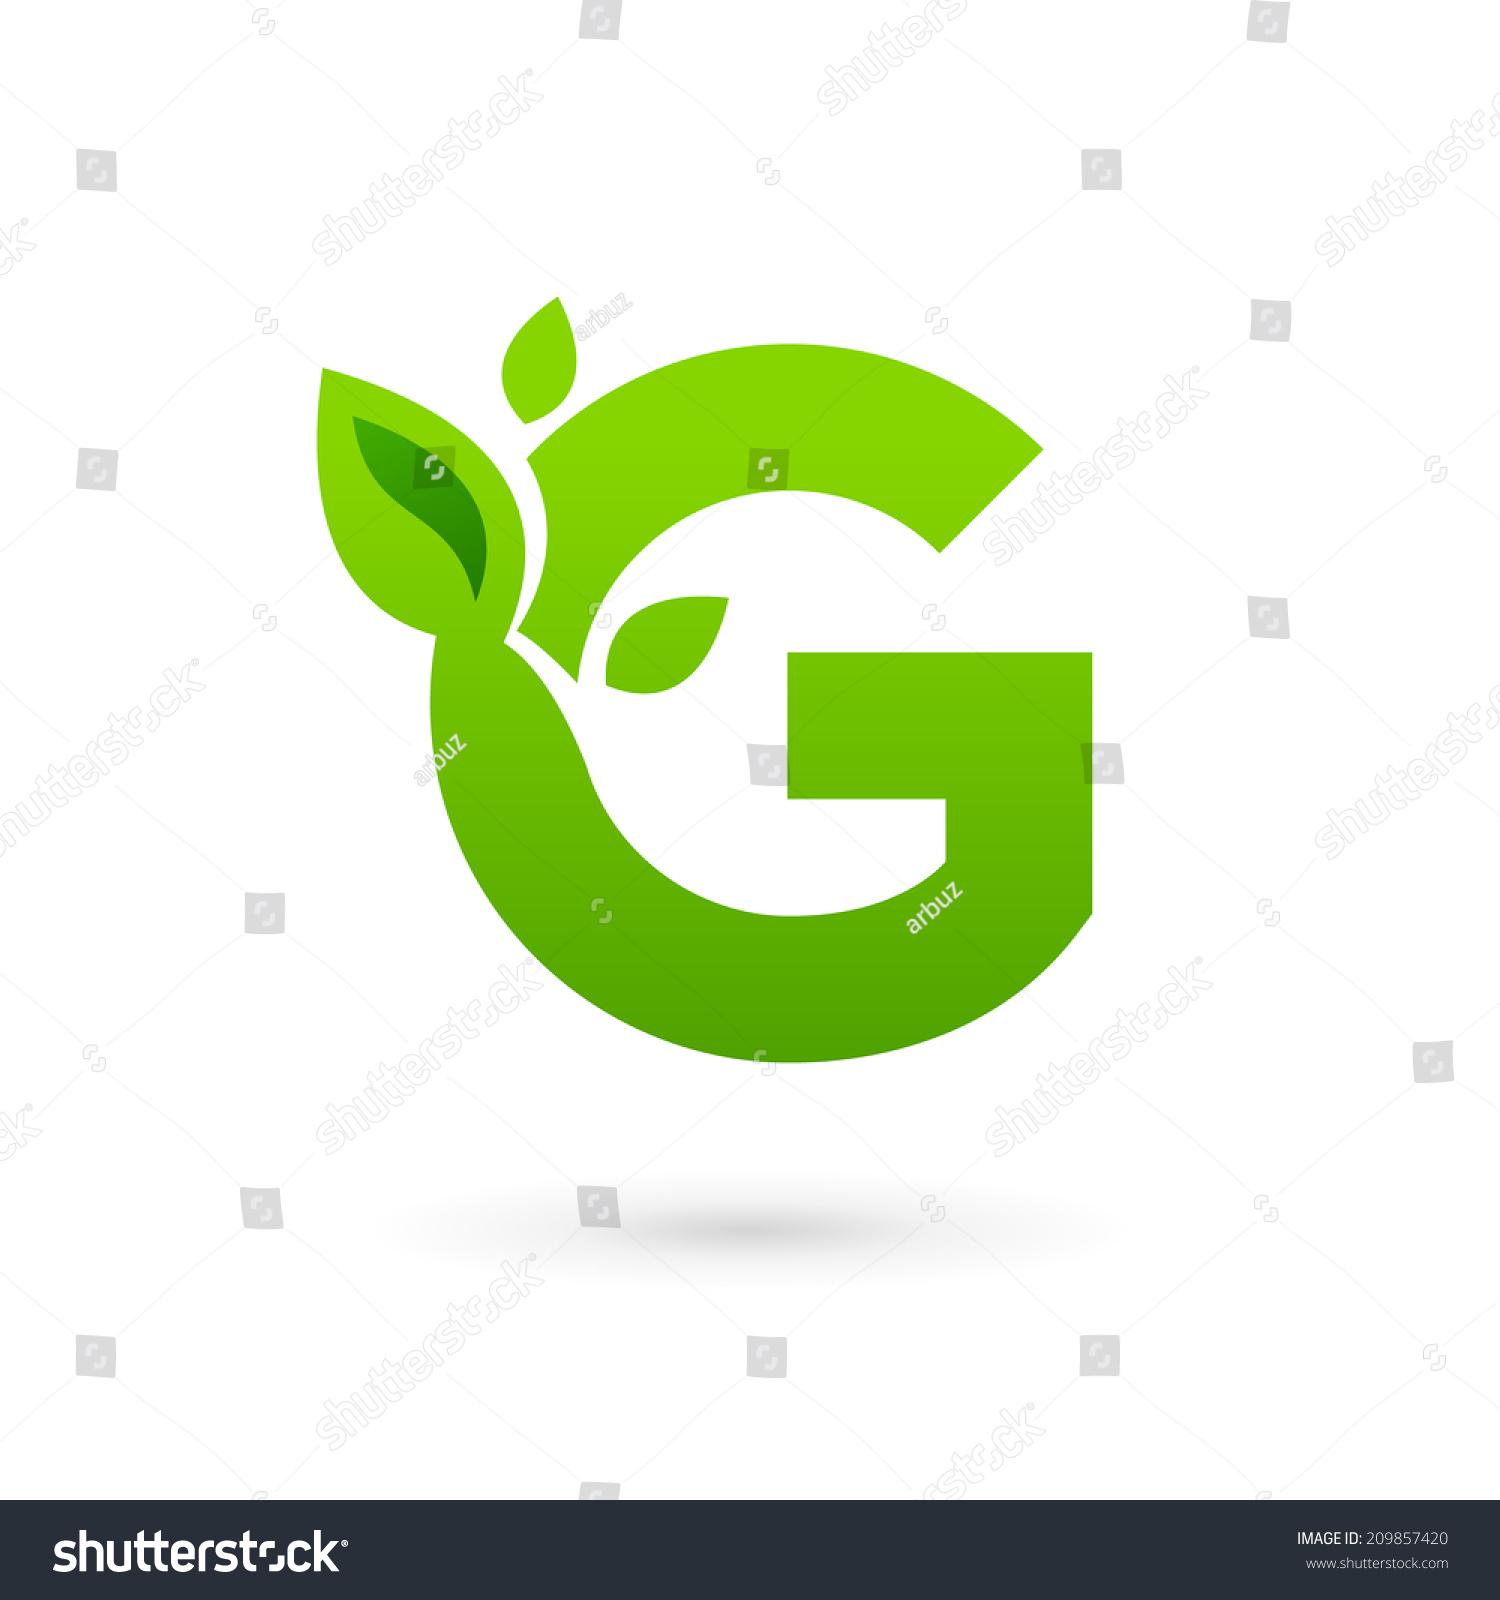 Green n logo